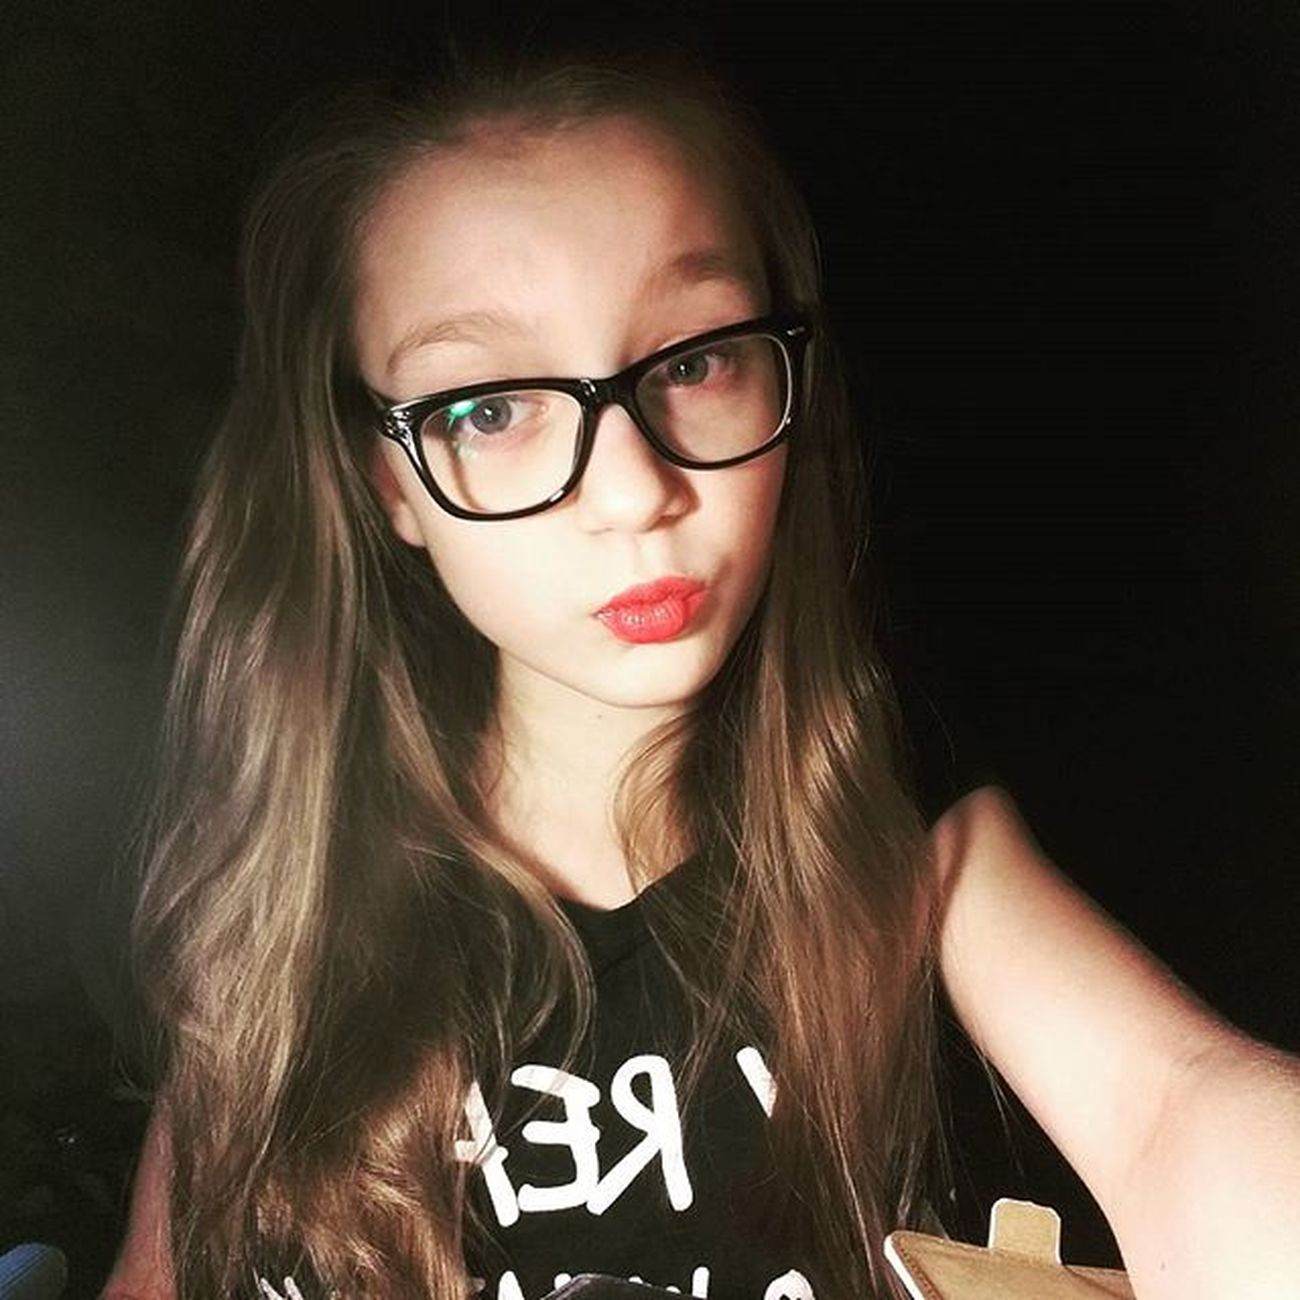 Selfiexd Selfie Instaselfie Instalike Instaphoto Instagirl Hotgirl Polishgirl Coolkids Supergirl F4F Followforfollow Follow4f Followmepleasenow Falow4Falow Likeforlike L4l Like4l